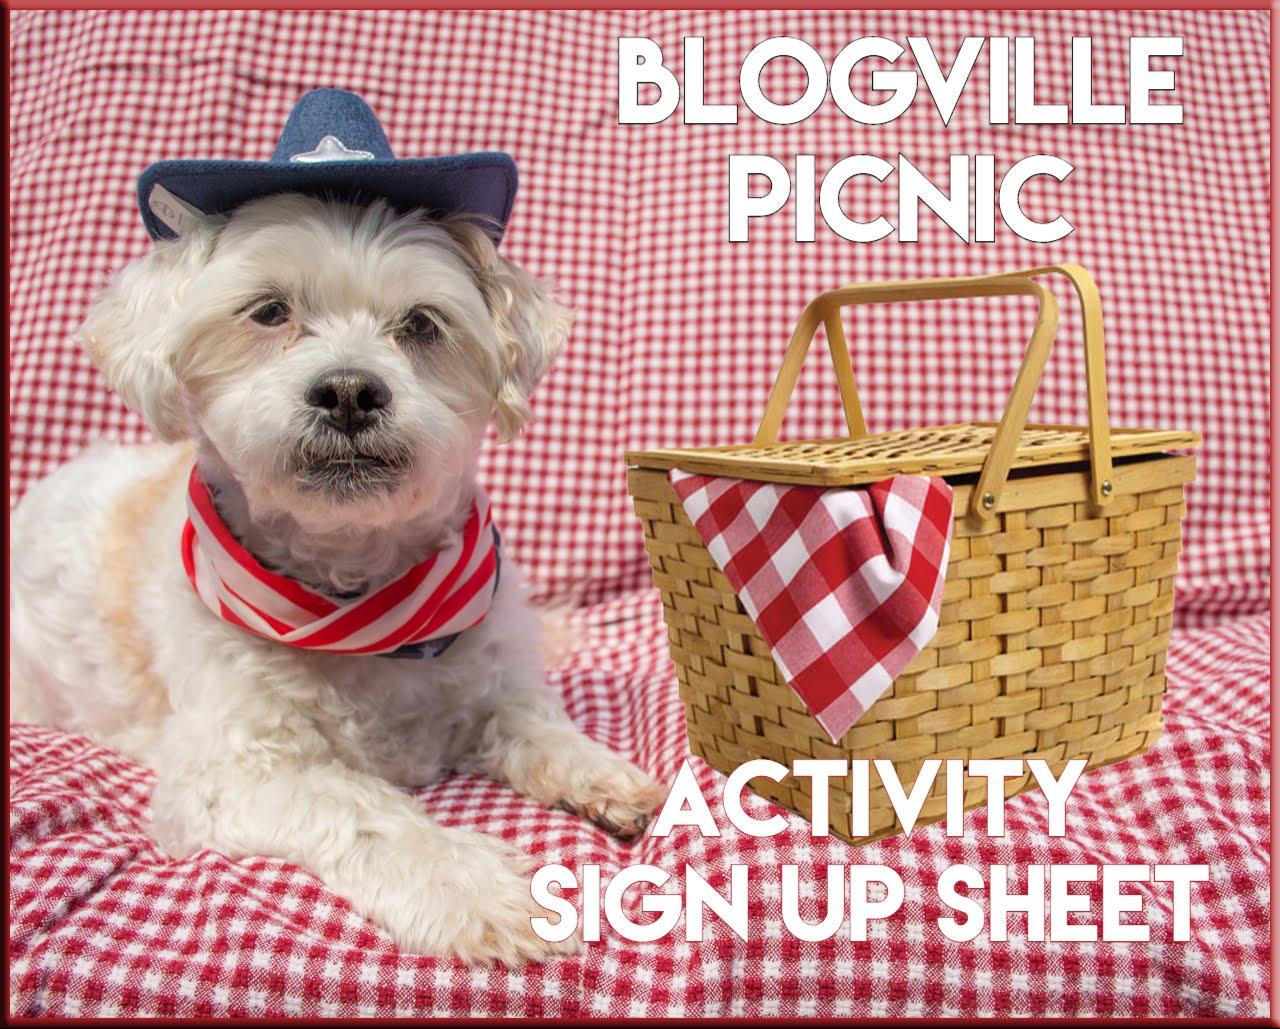 Blogville Picnic